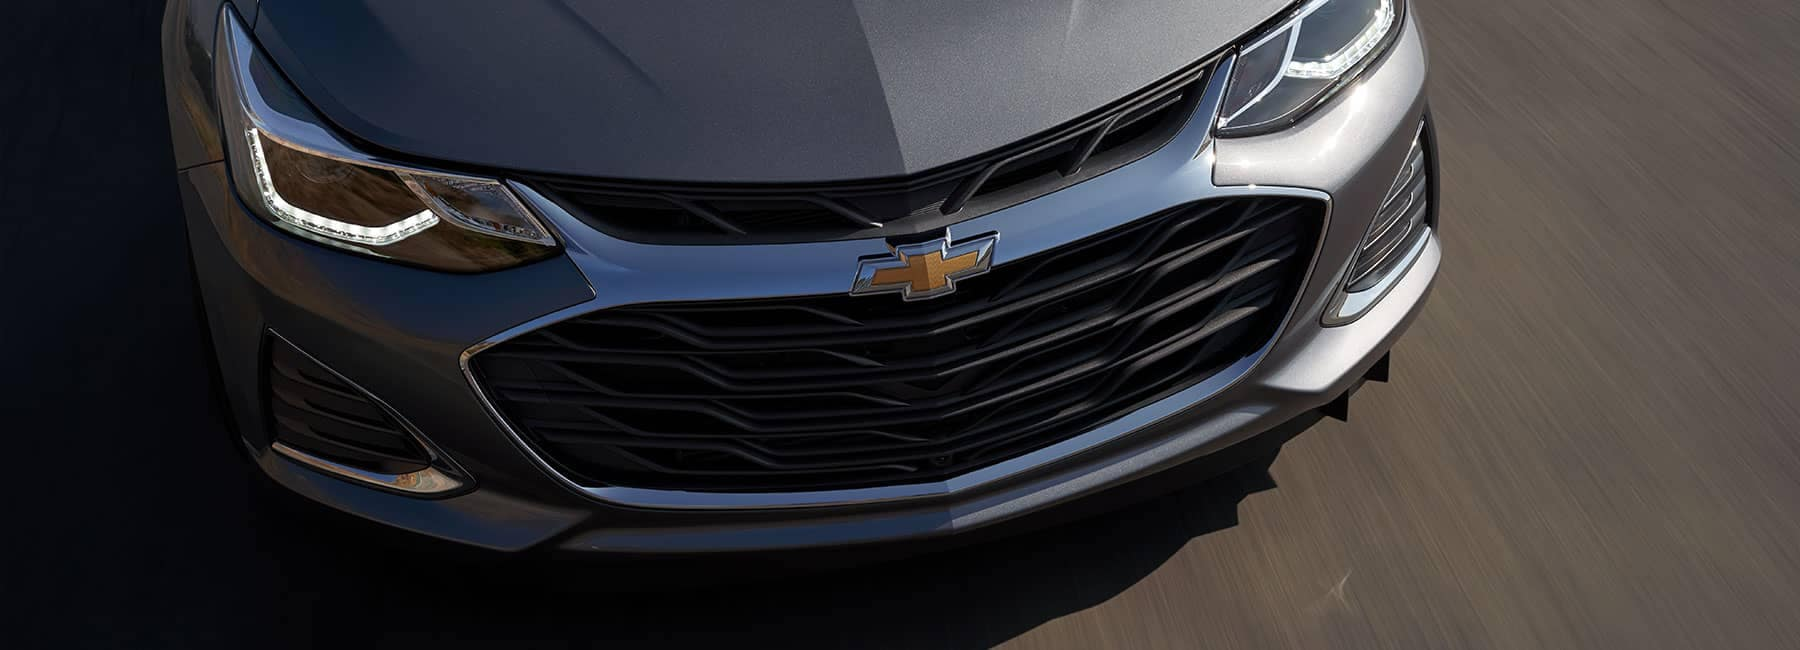 2019 chevy car